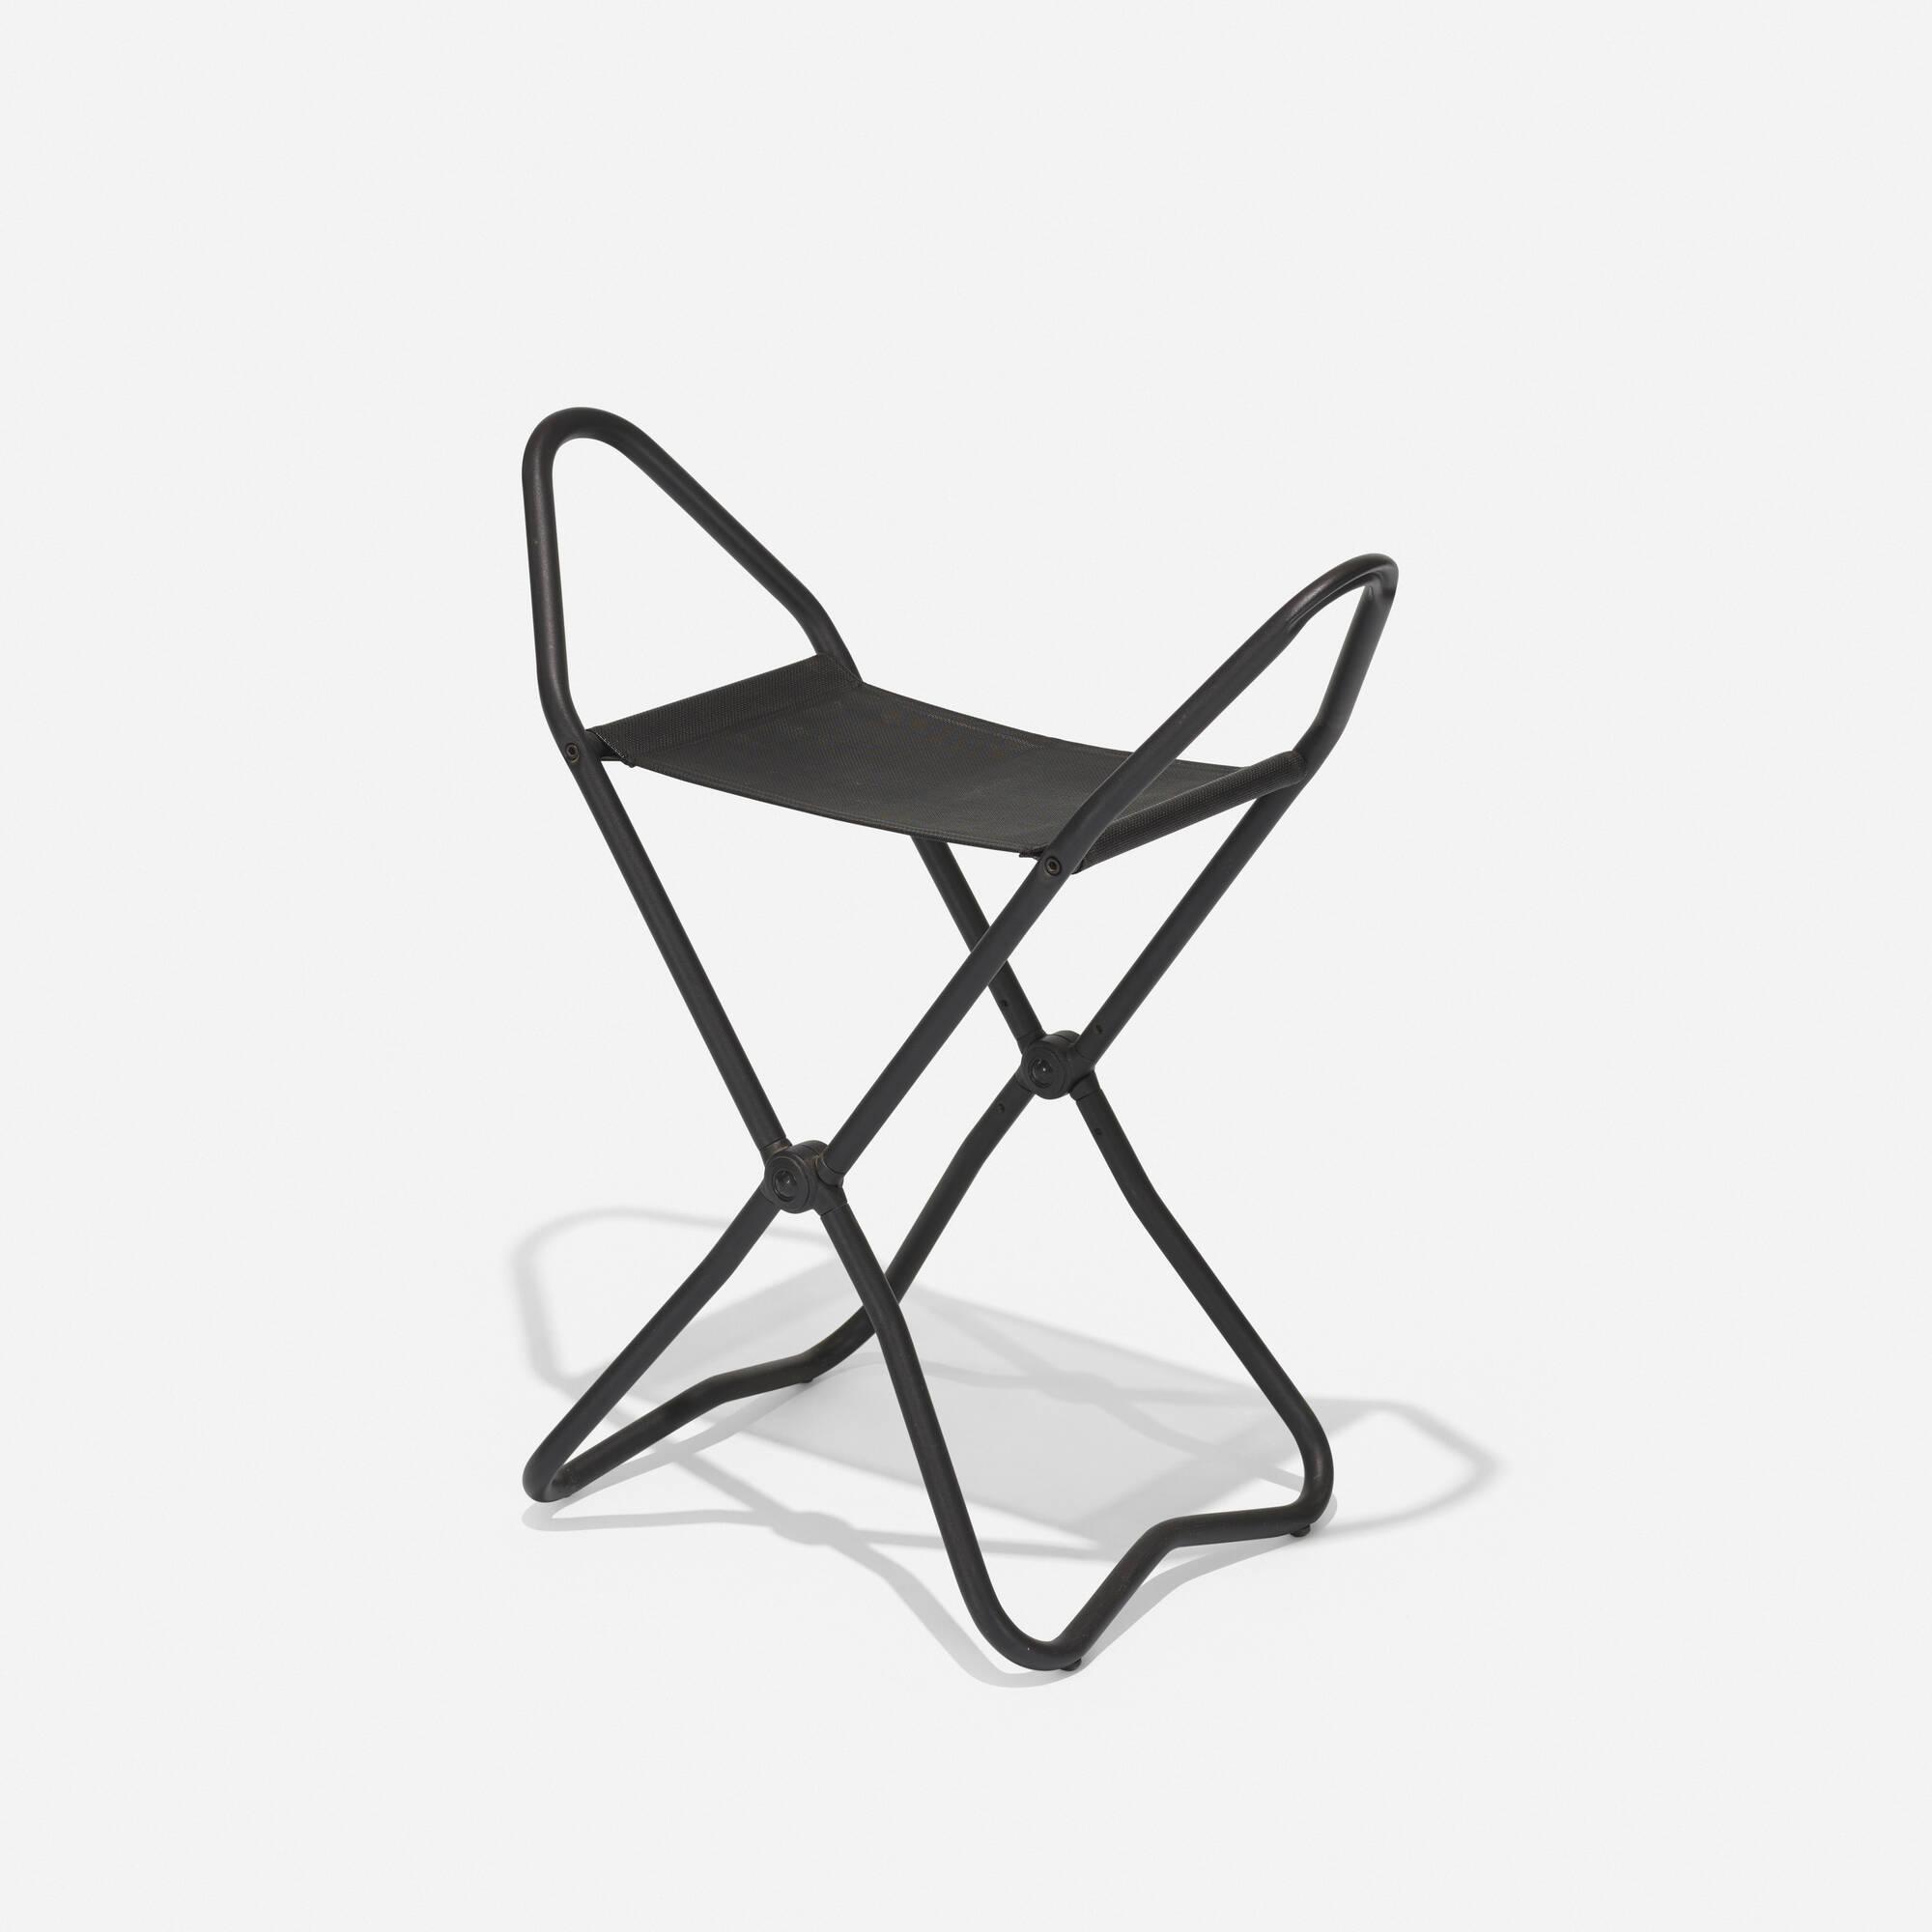 341: A & E Design (Tom Ahlström and Hans Ehrich) / Stockholm II folding stool (1 of 3)